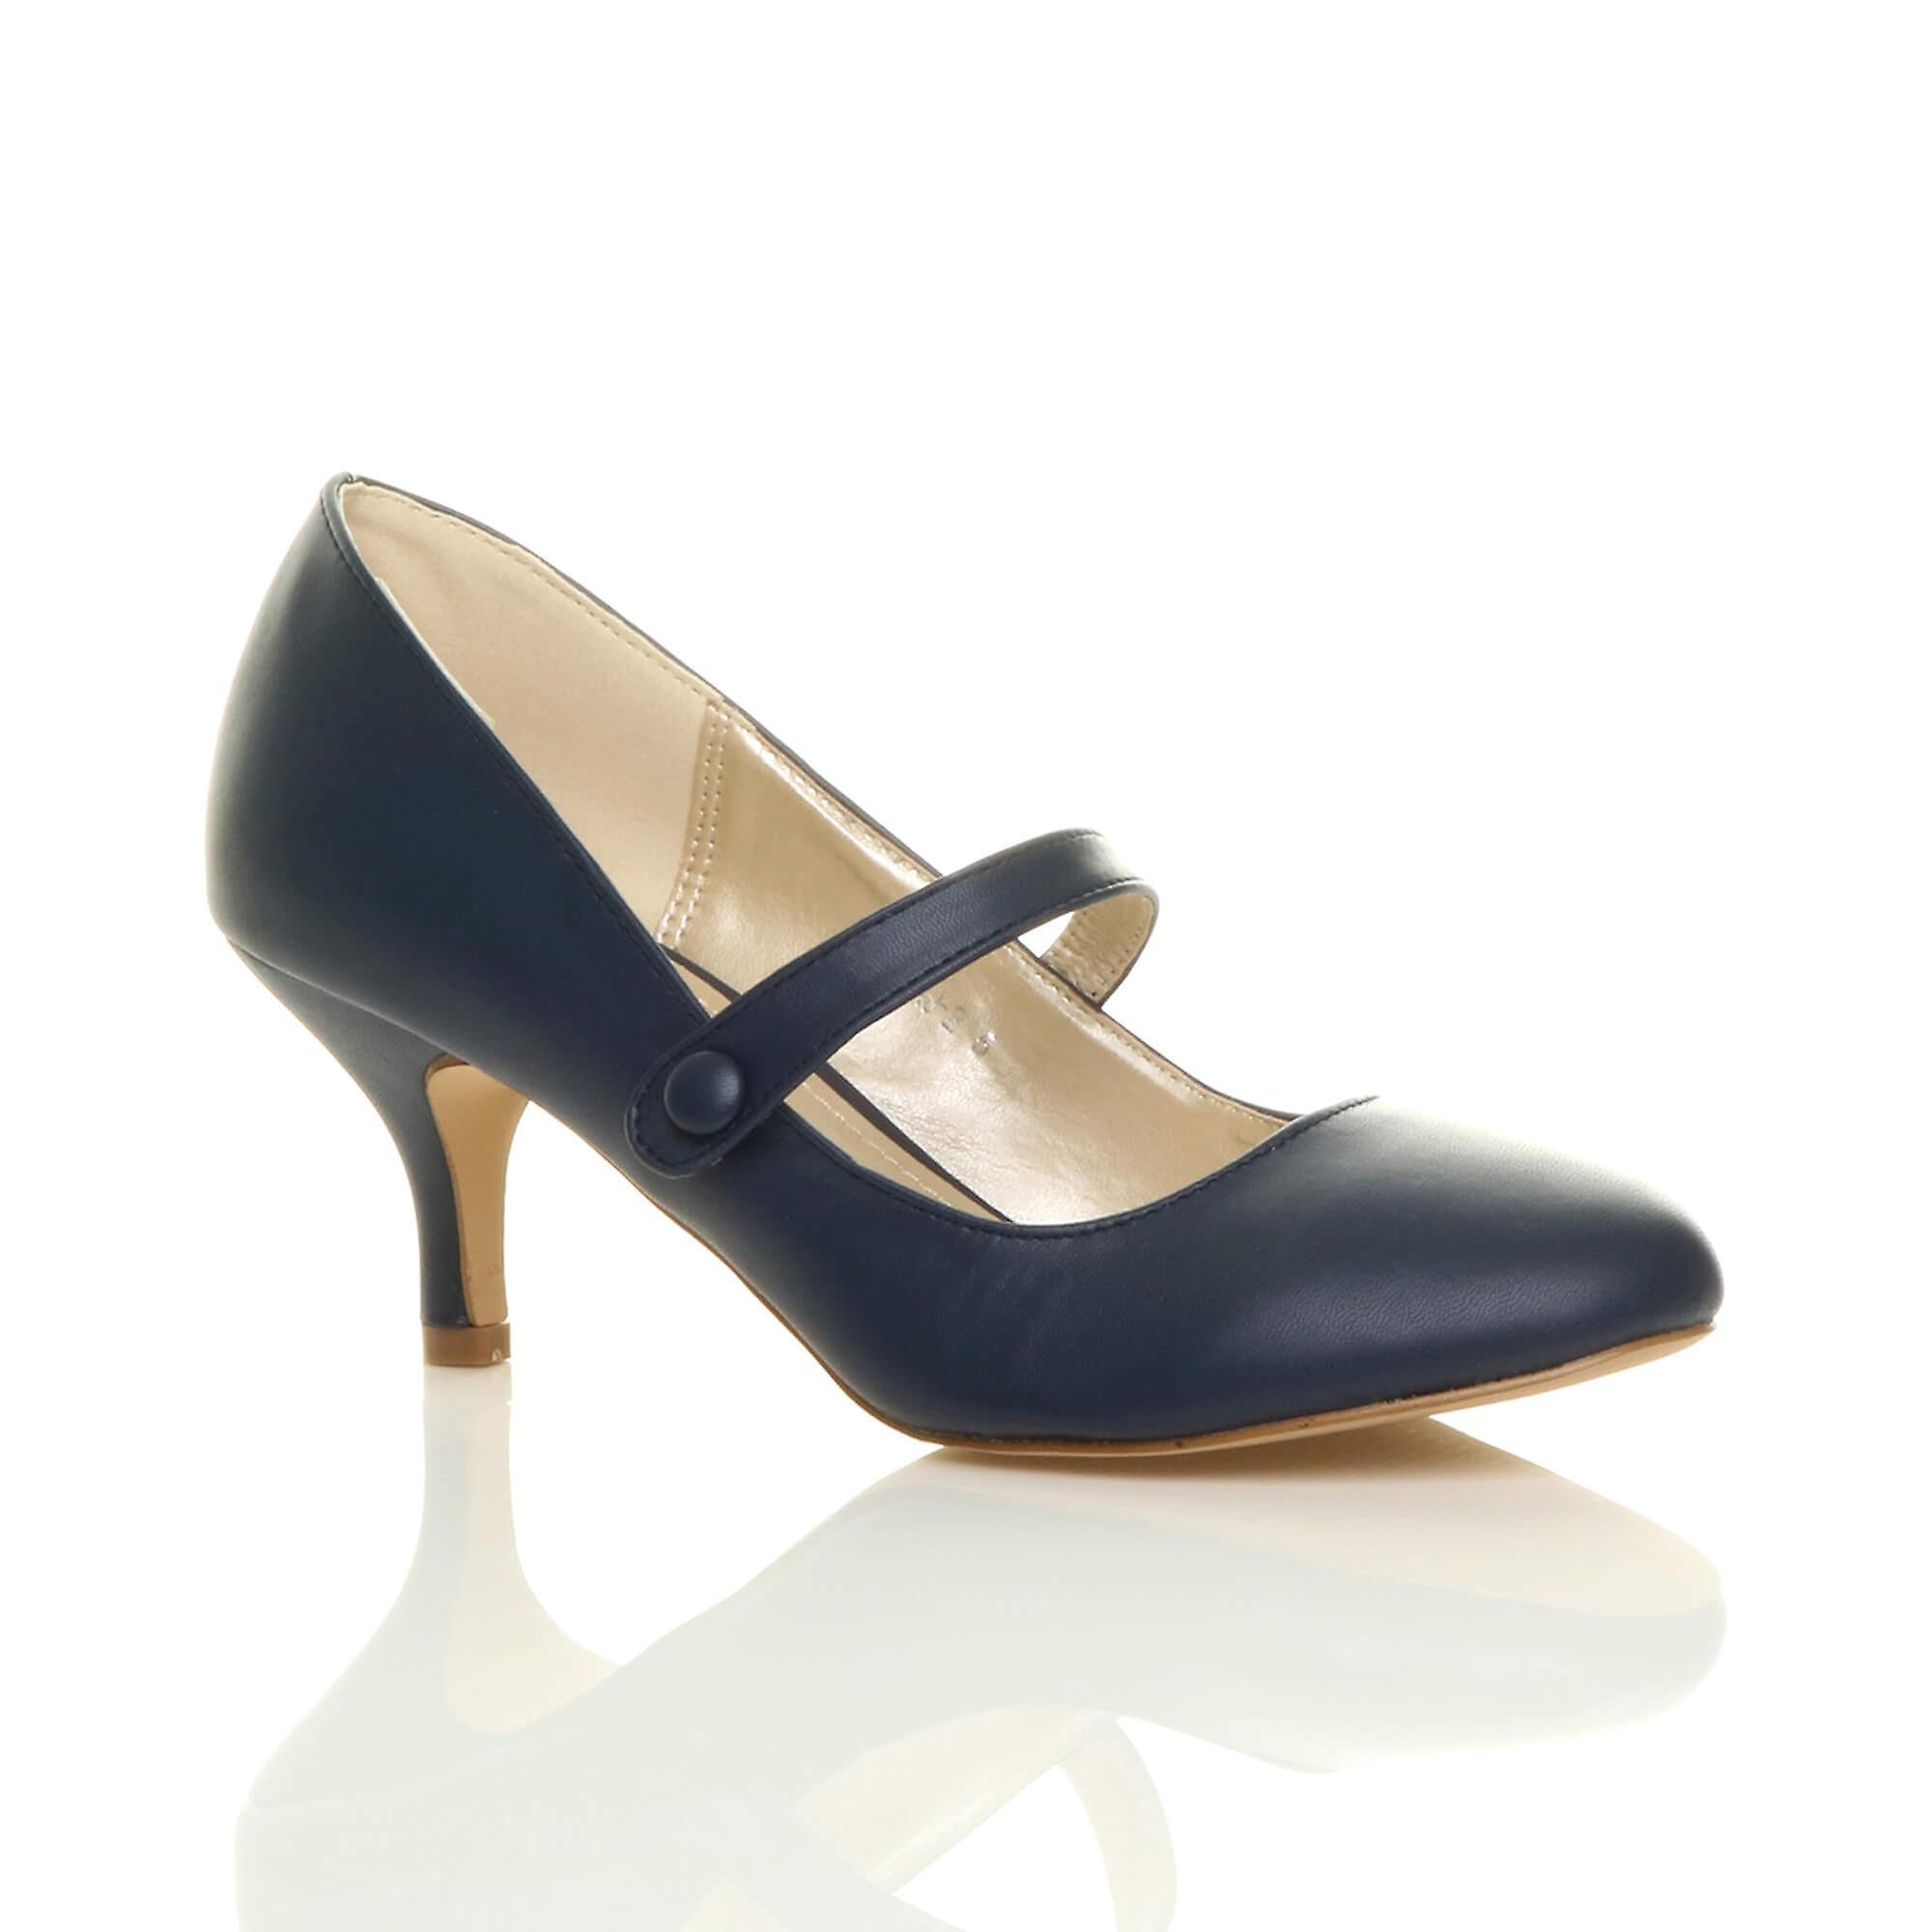 083b11dd383 Ajvani womens low mid heel mary jane strap work party court shoes pumps jpg  2000x2000 Womens